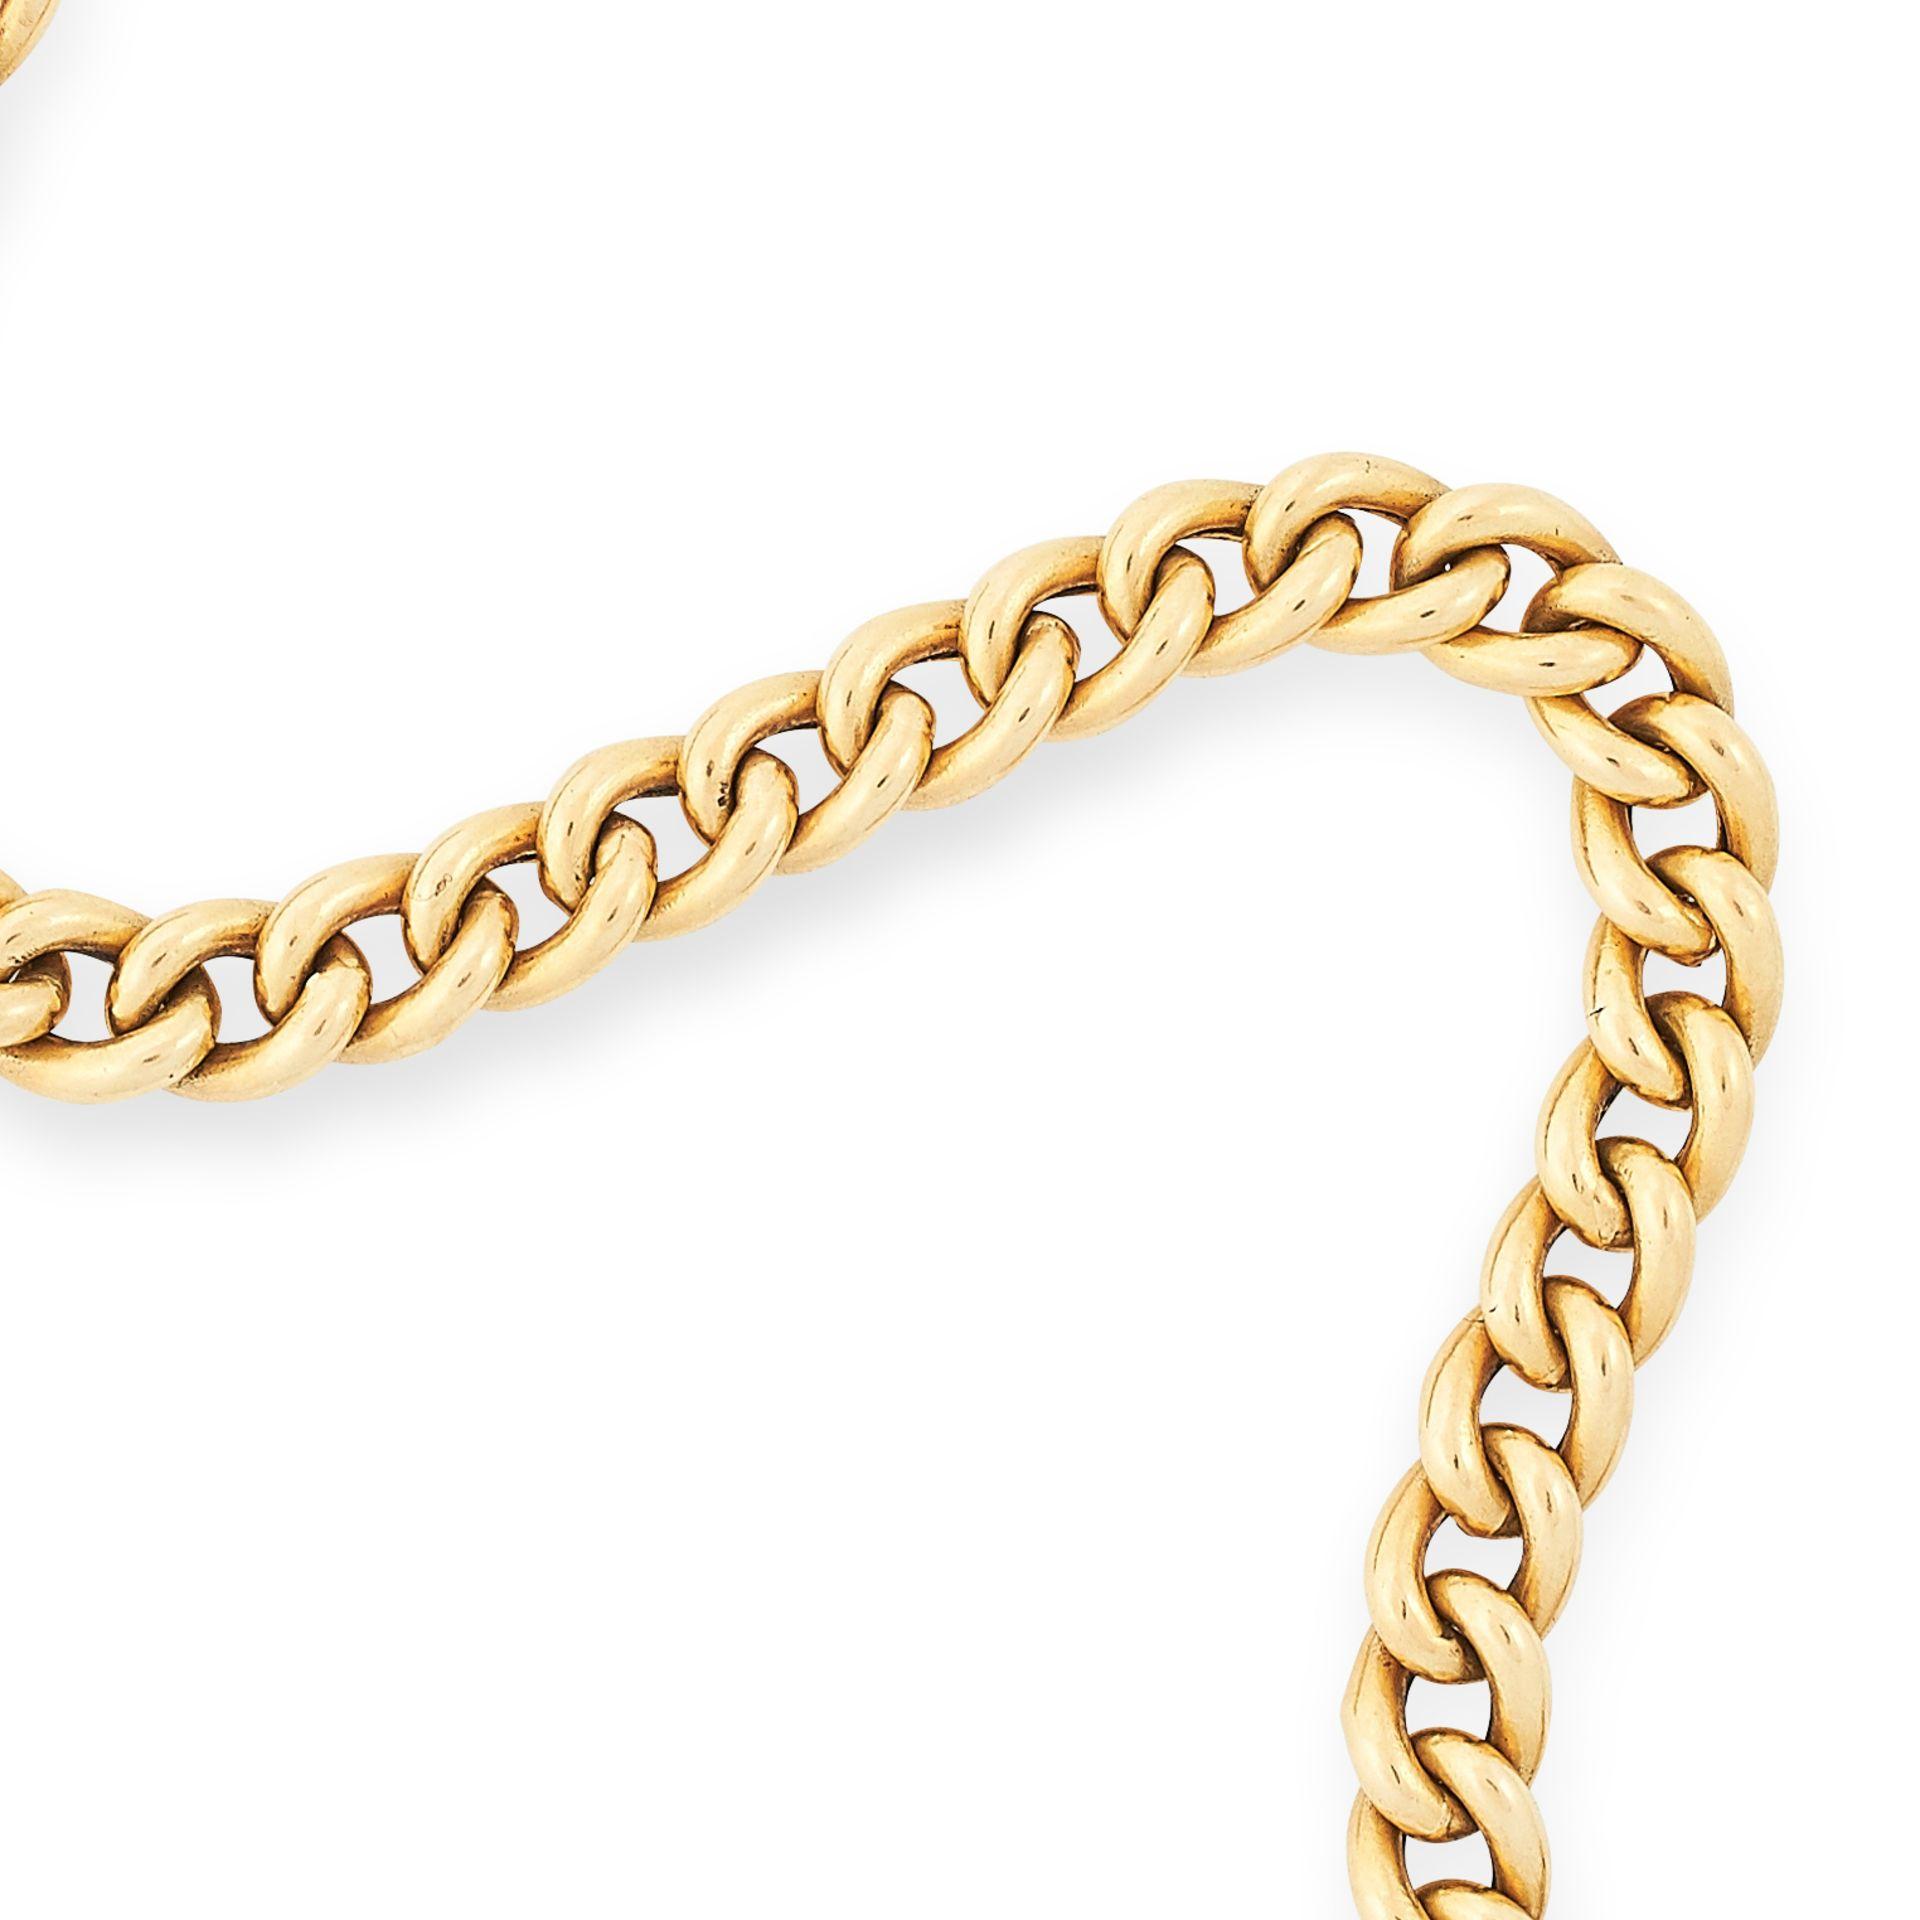 FANCY LINK BRACELET comprising of a row of textured curb links, 20cm, 16.8g. - Bild 2 aus 2